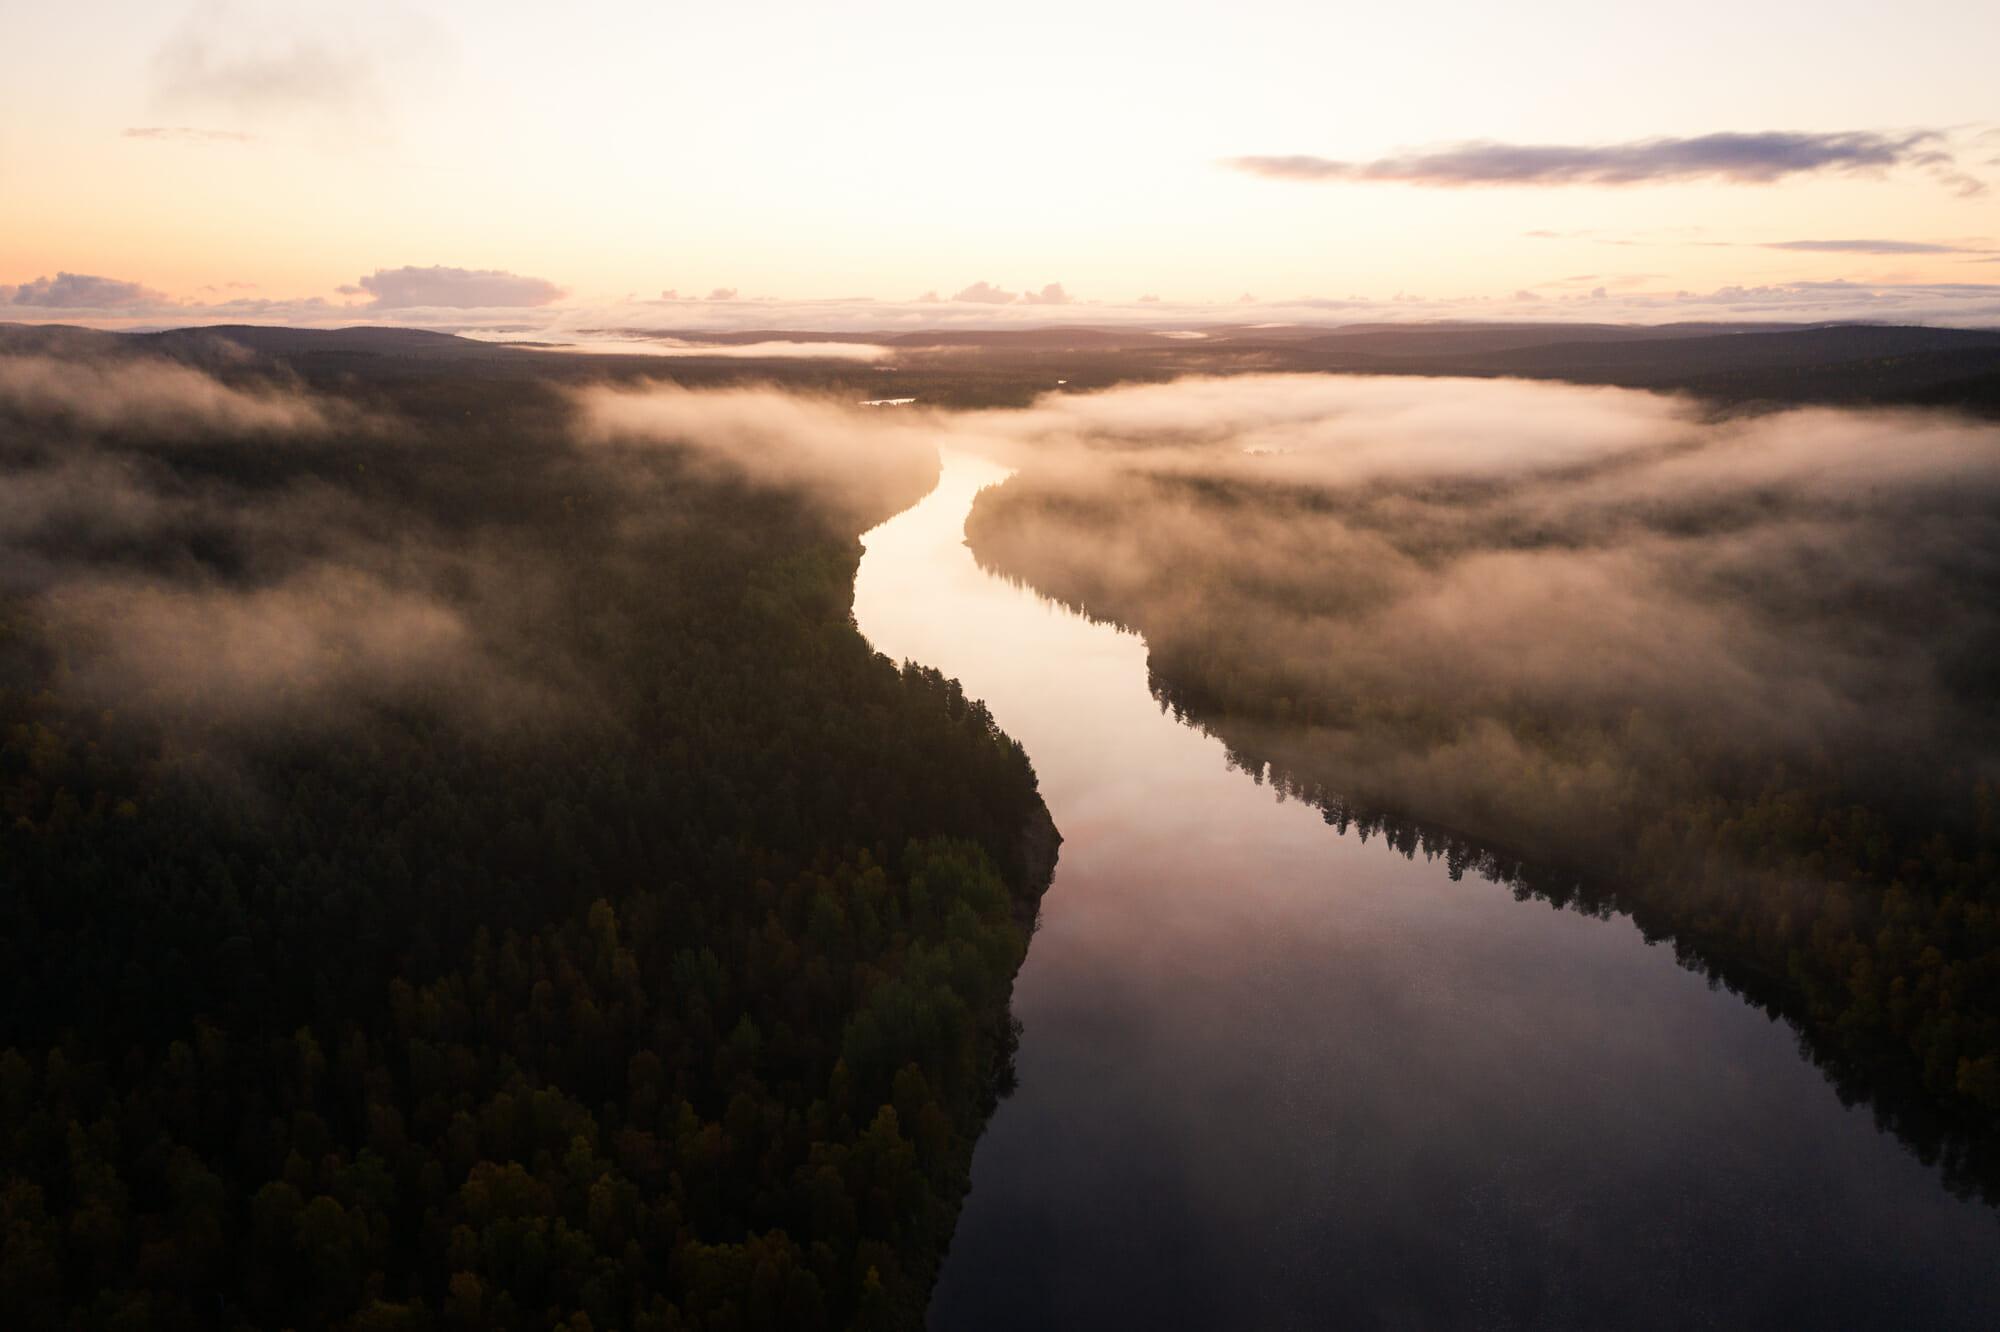 zone sauvage d'Hammastunturi, Ivalojoki